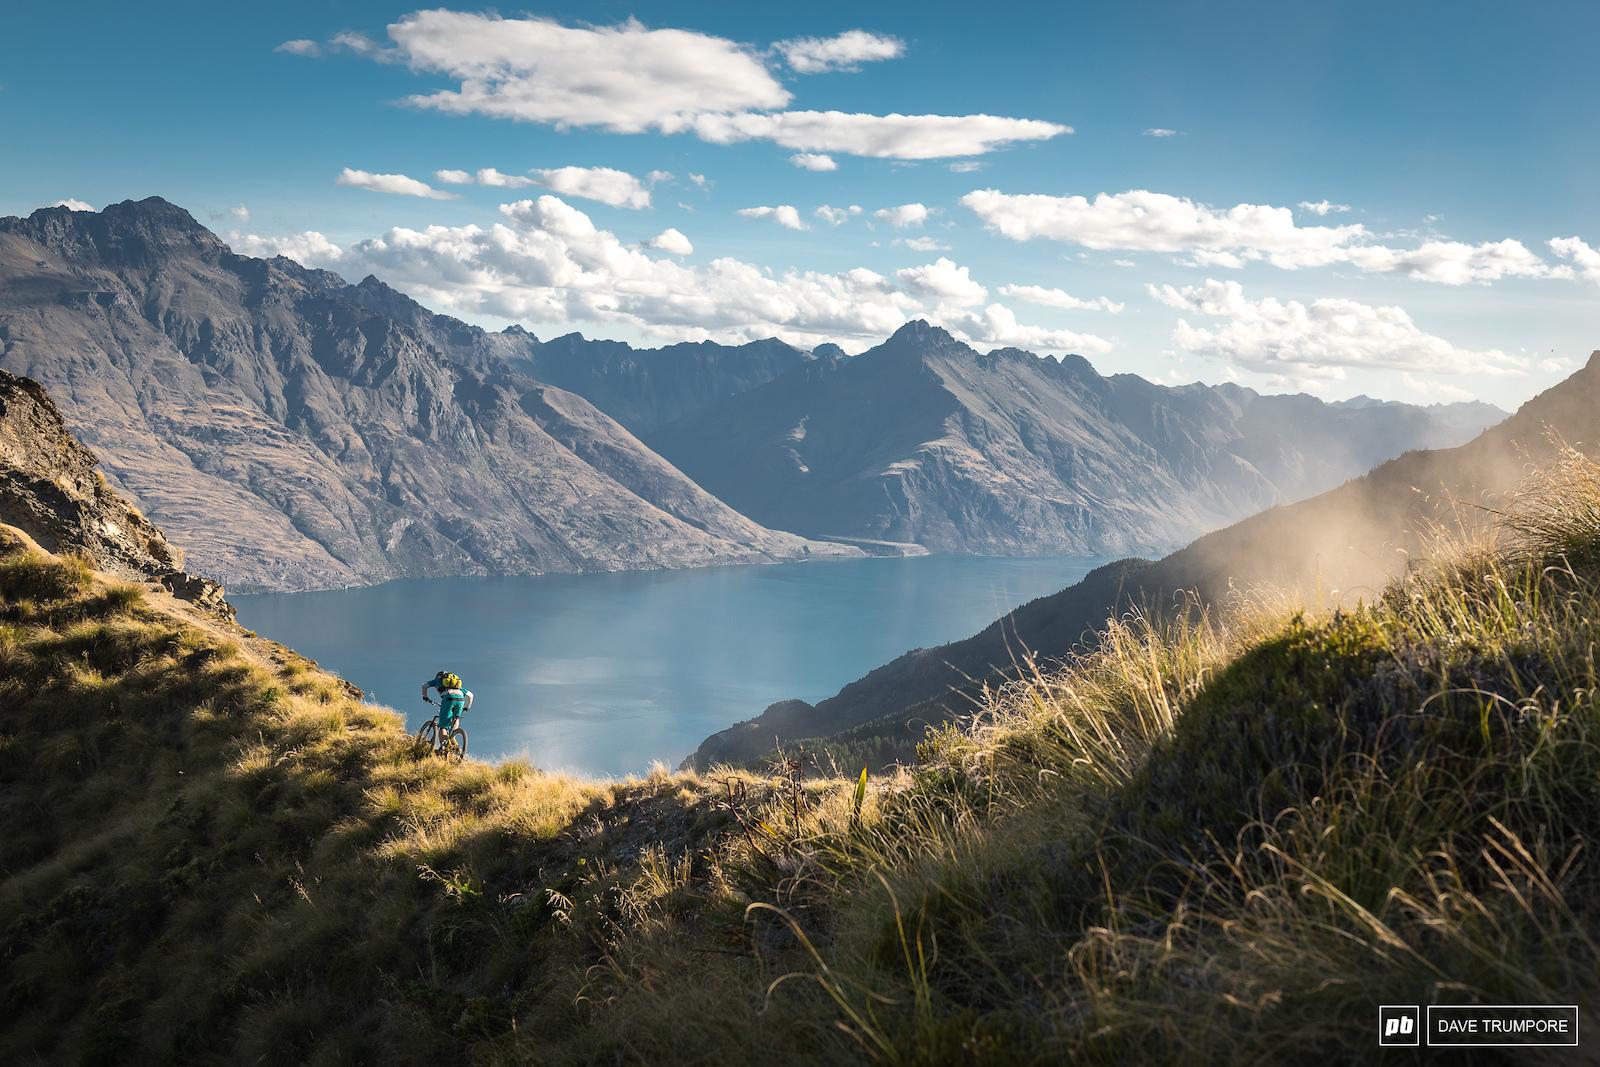 Joey Schusler above Fern Hill on the Missing Link Trail. Queenstown NZ